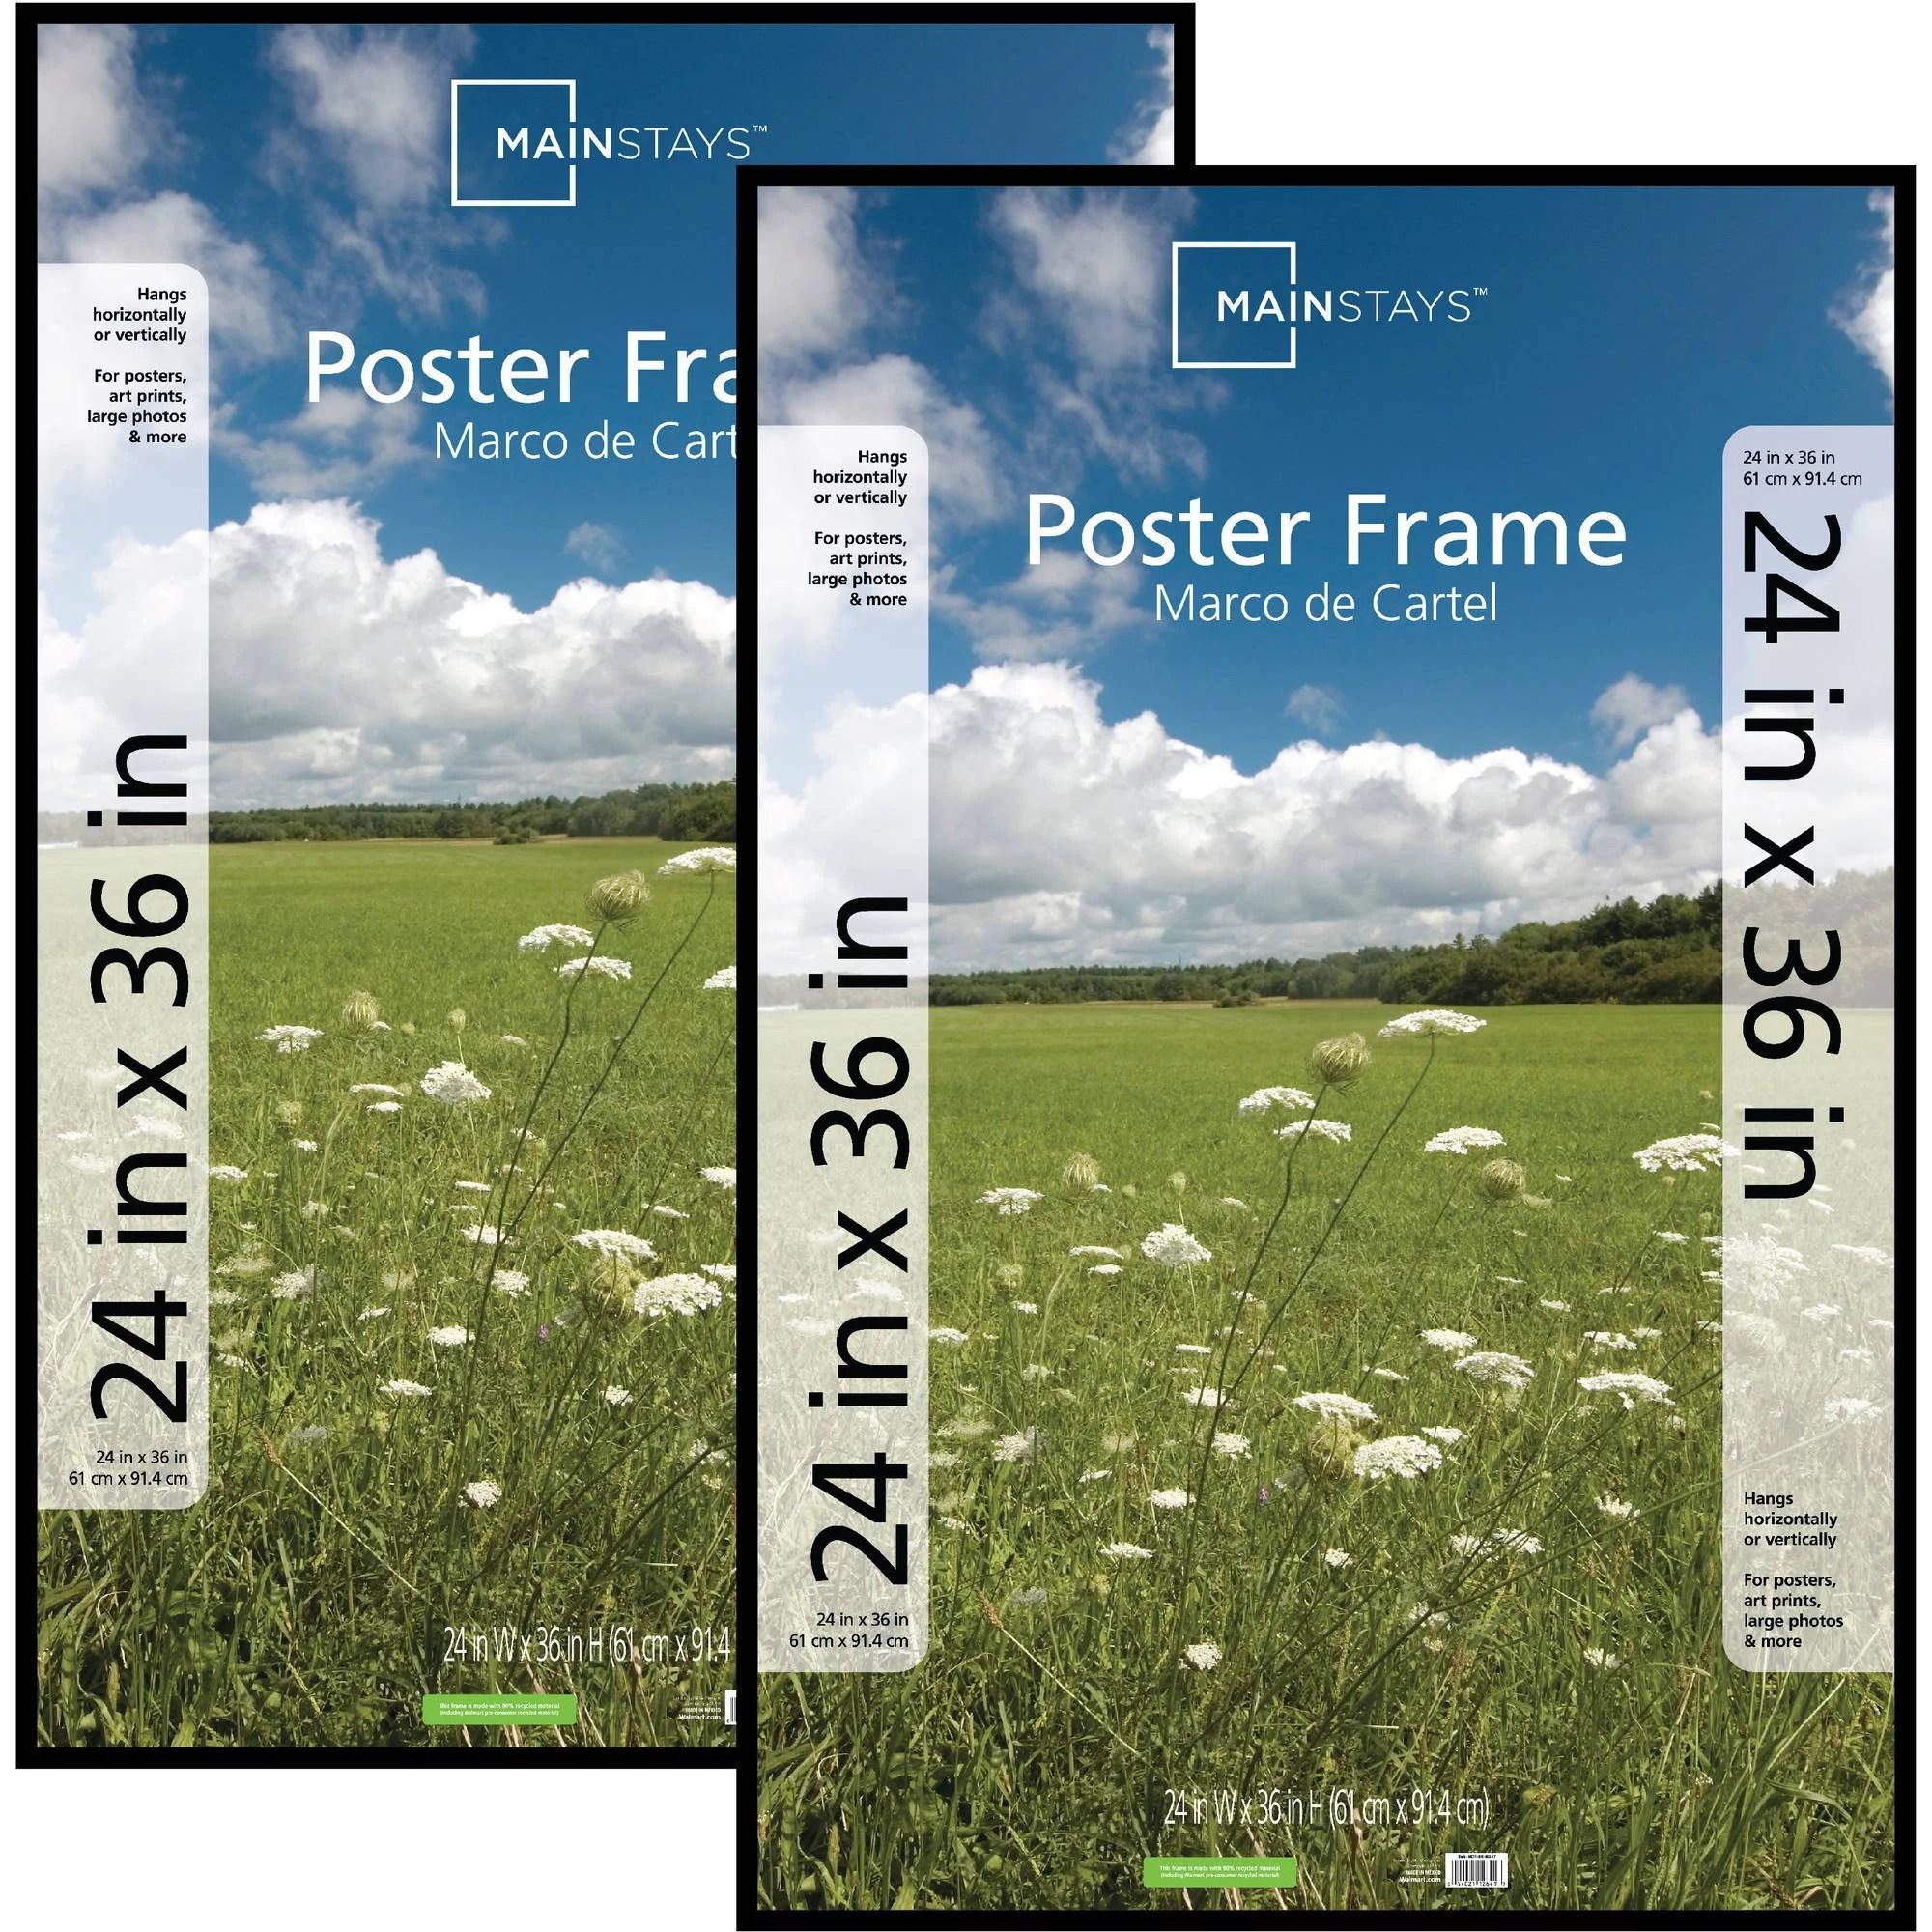 mainstays 24x36 basic poster picture frame black set of 2